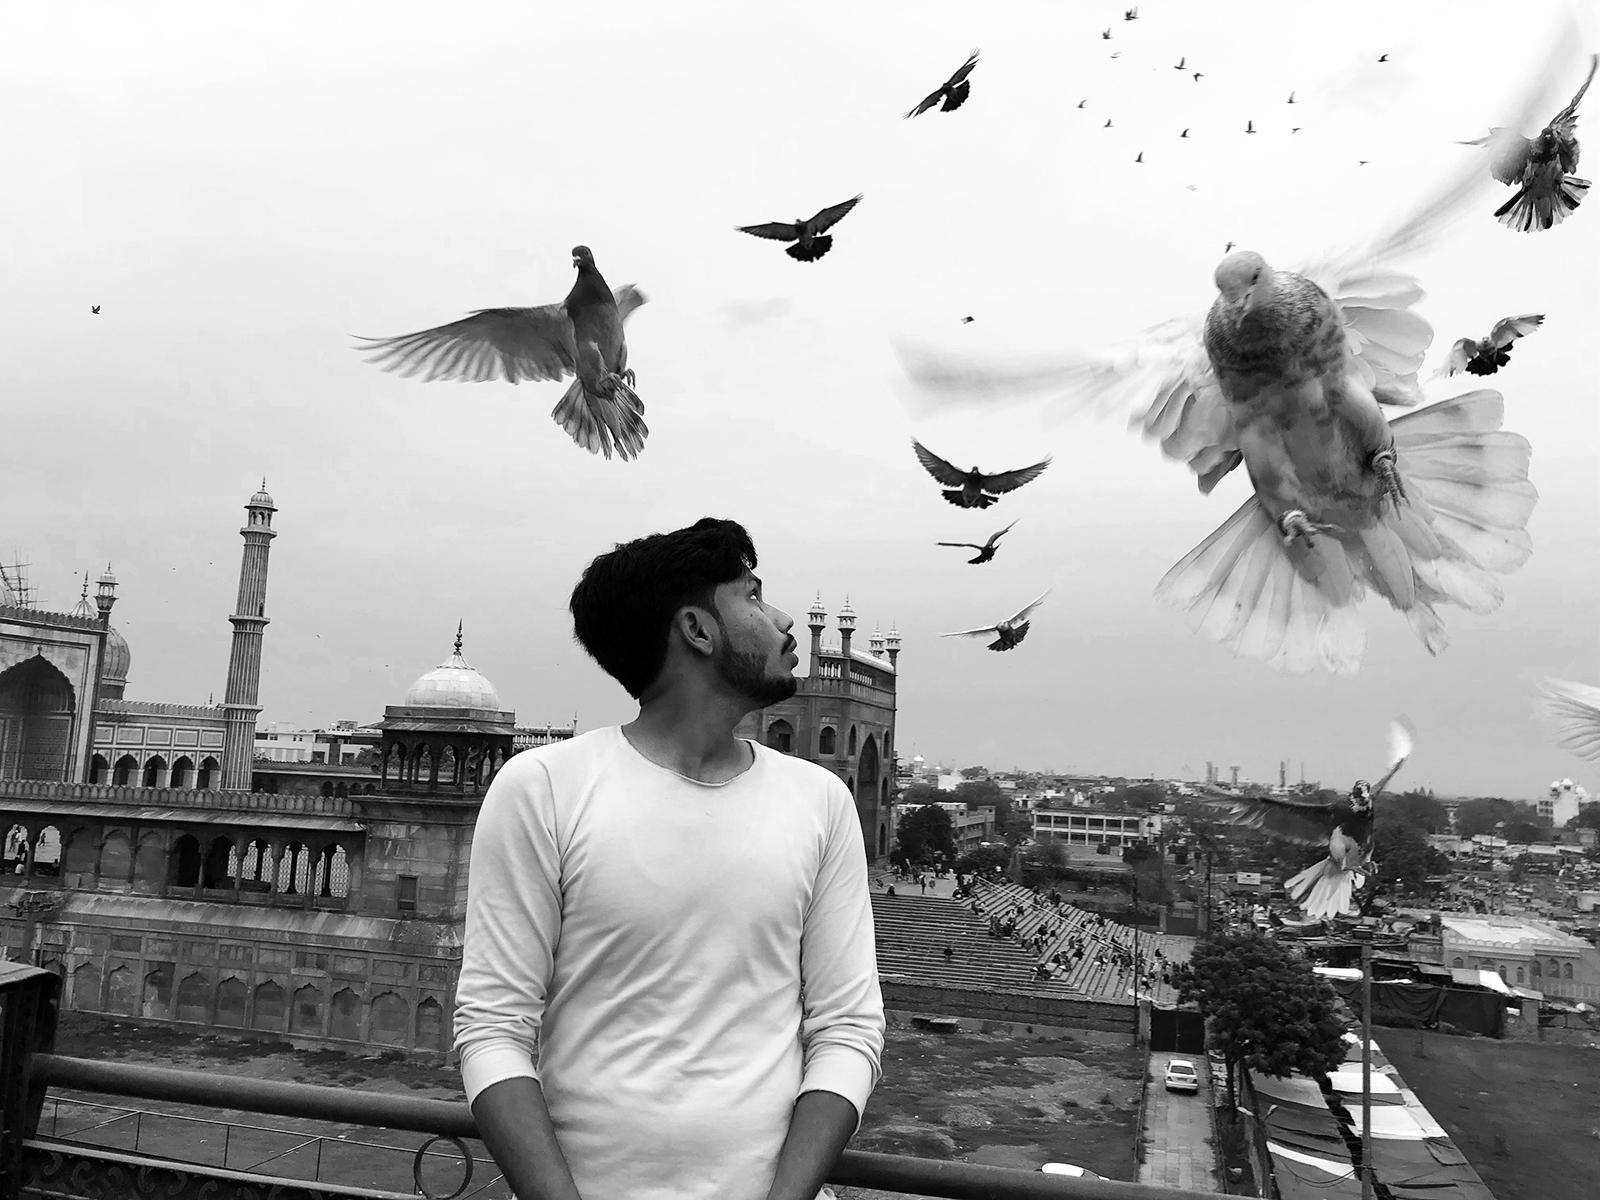 Robi_Chakraborty_pigeons.jpg